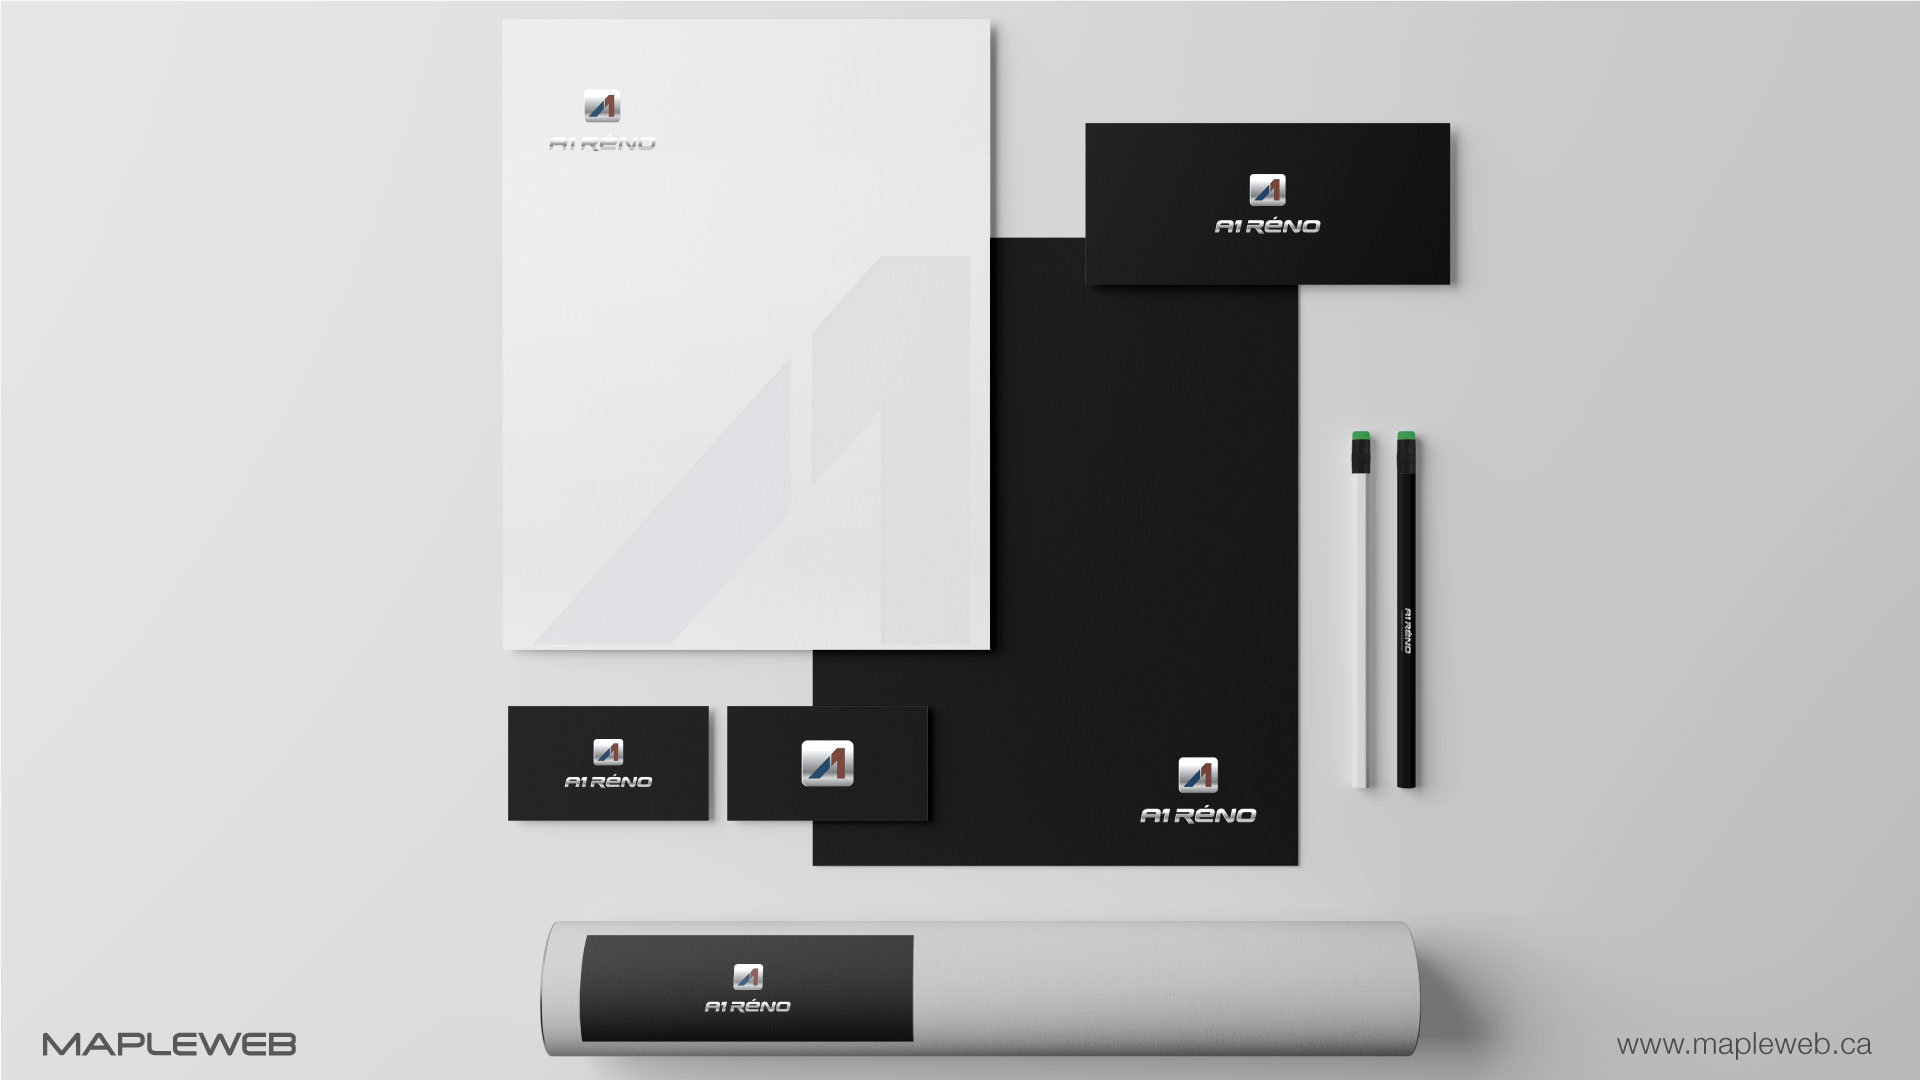 a1-reno-brand-logo-design-by-mapleweb-vancouver-canada-logo-stationery-mock